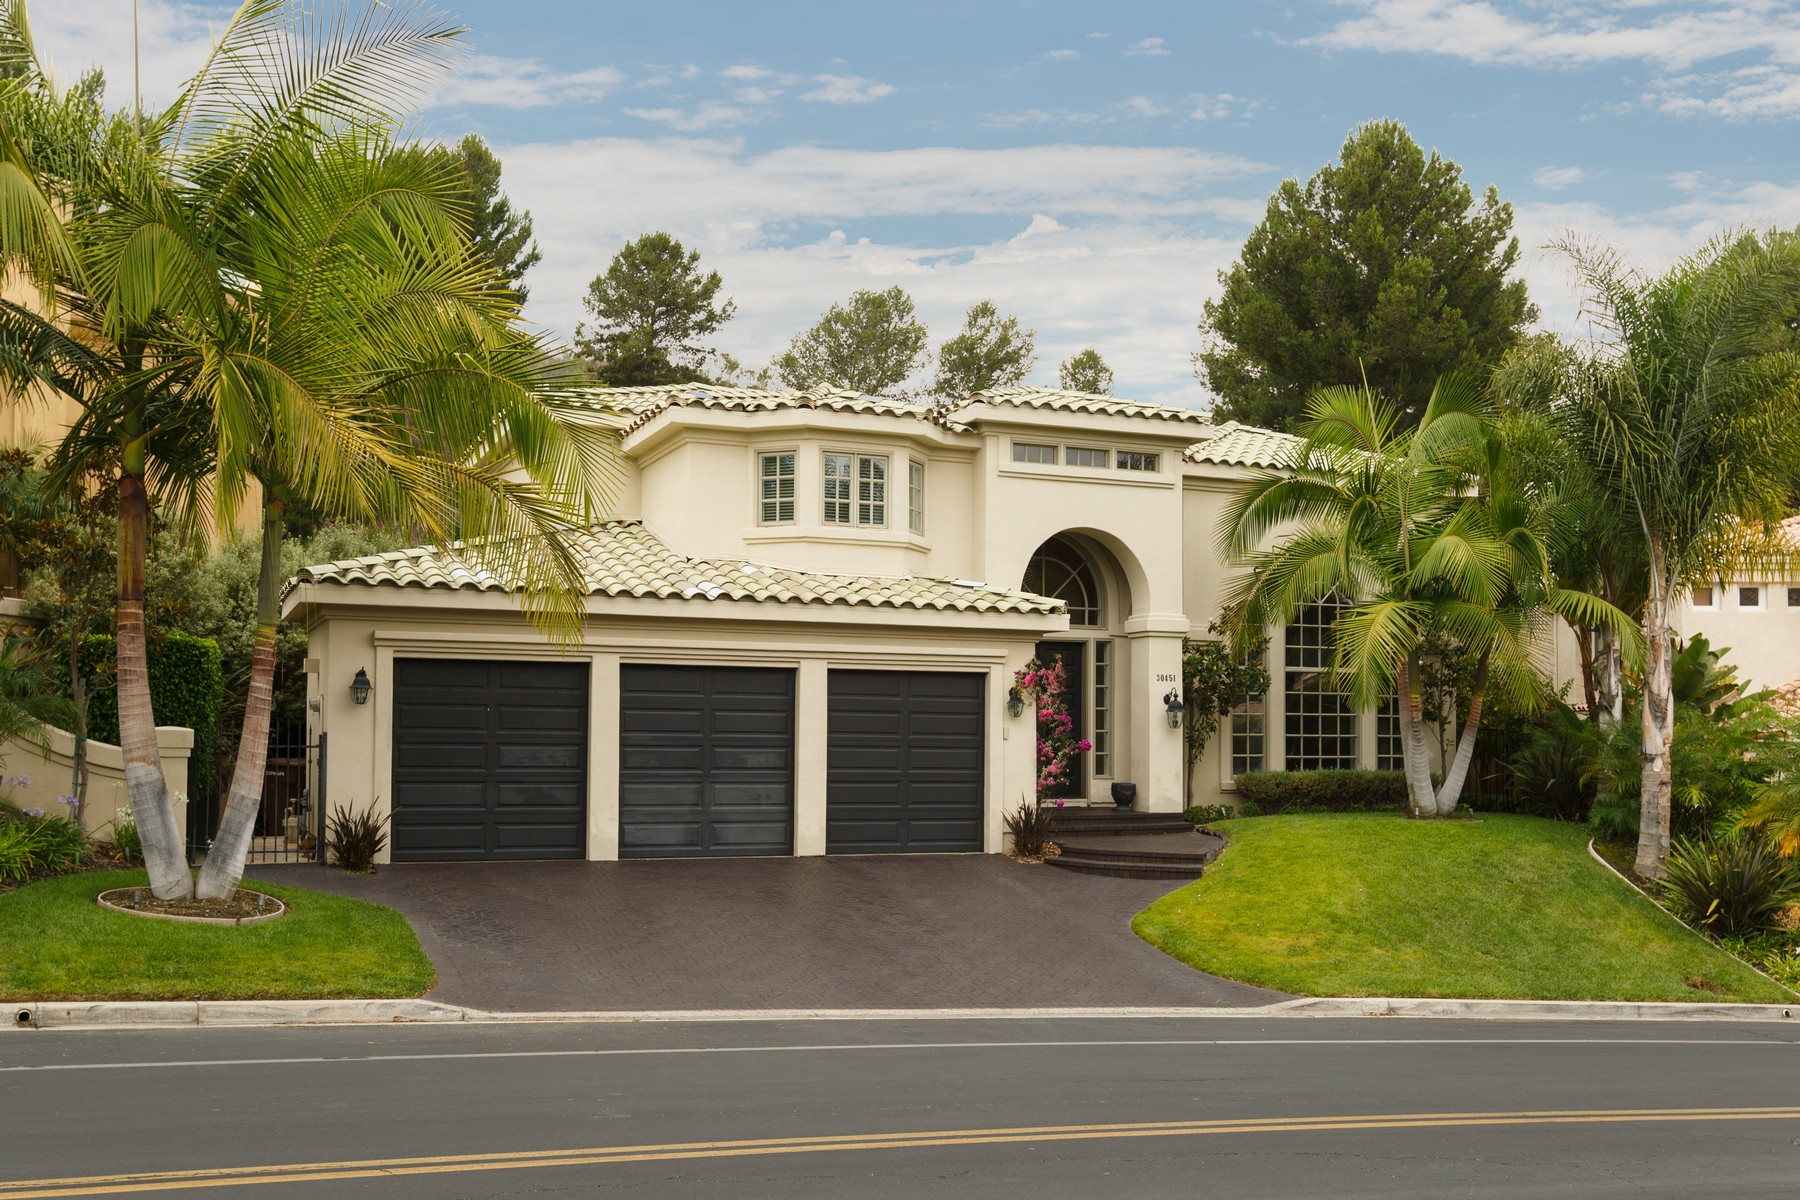 Single Family Home for Sale at 30451 Marbella Vista San Juan Capistrano, California 92675 United States